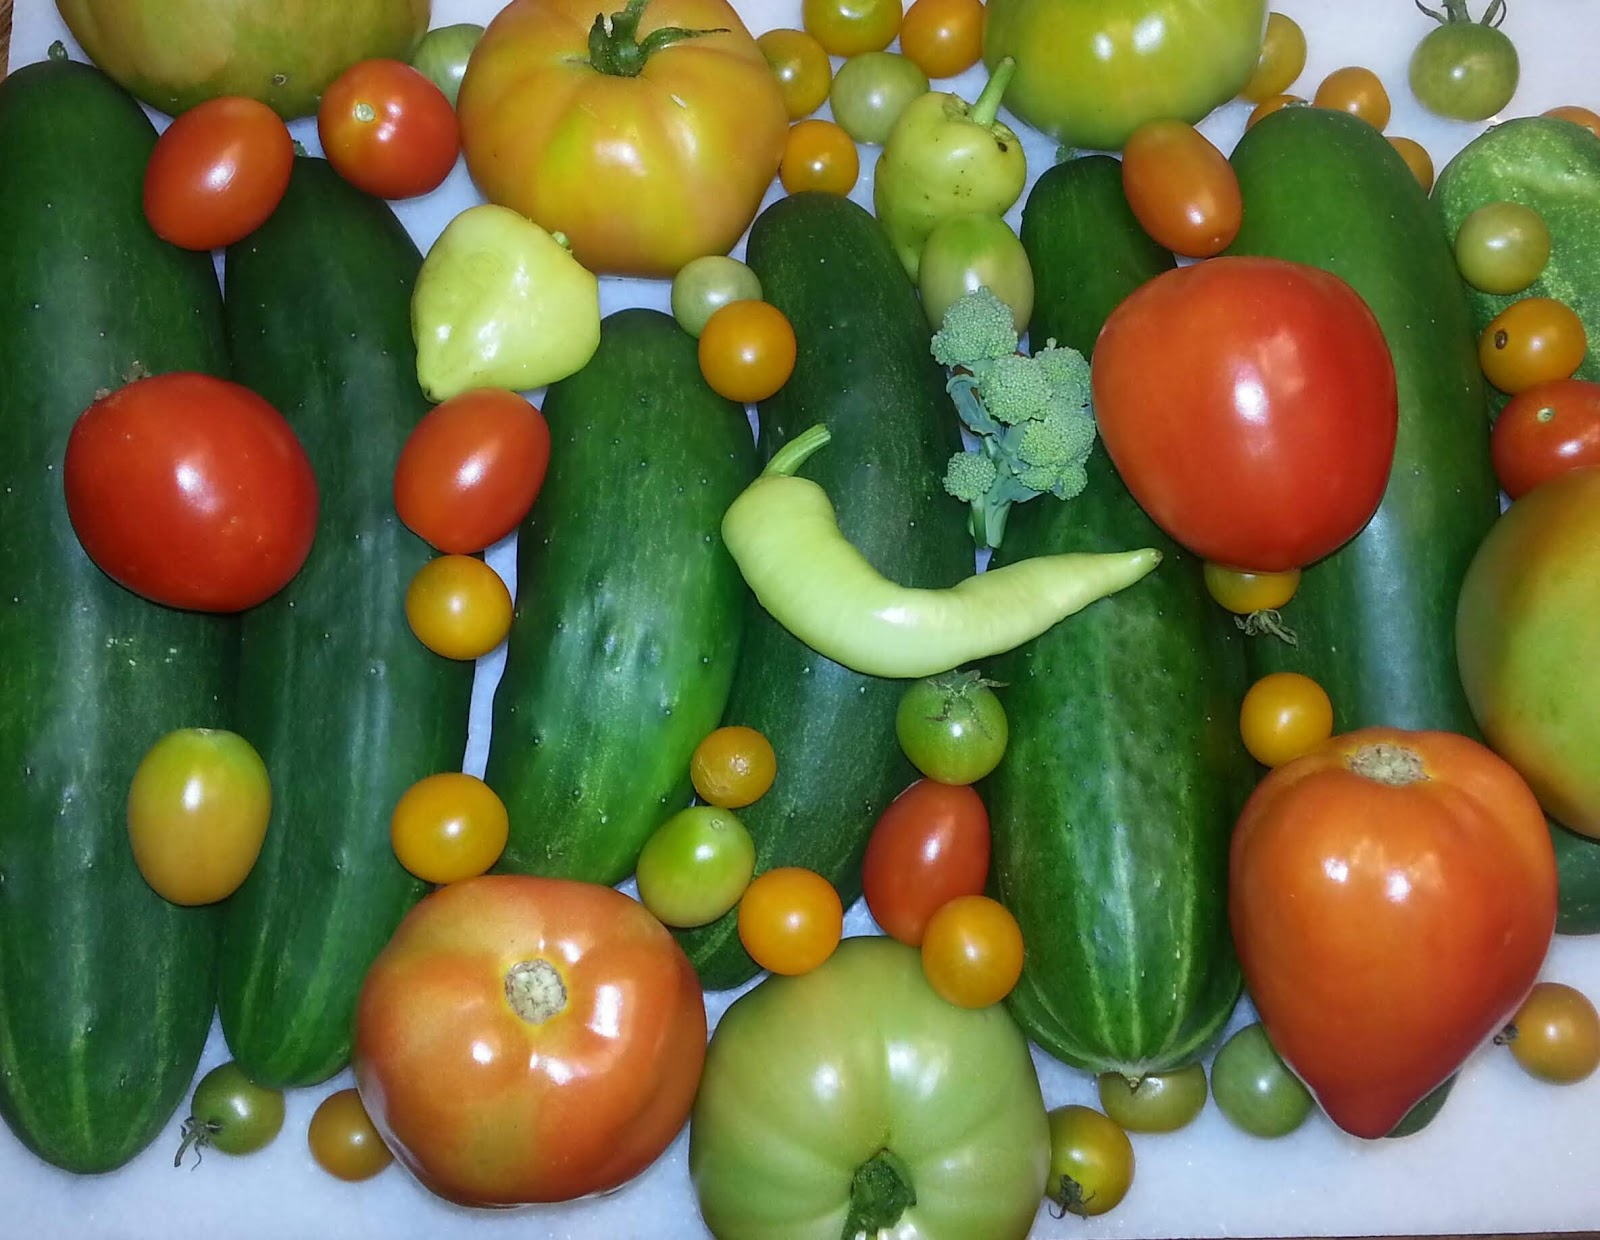 gardening harvest haul picture